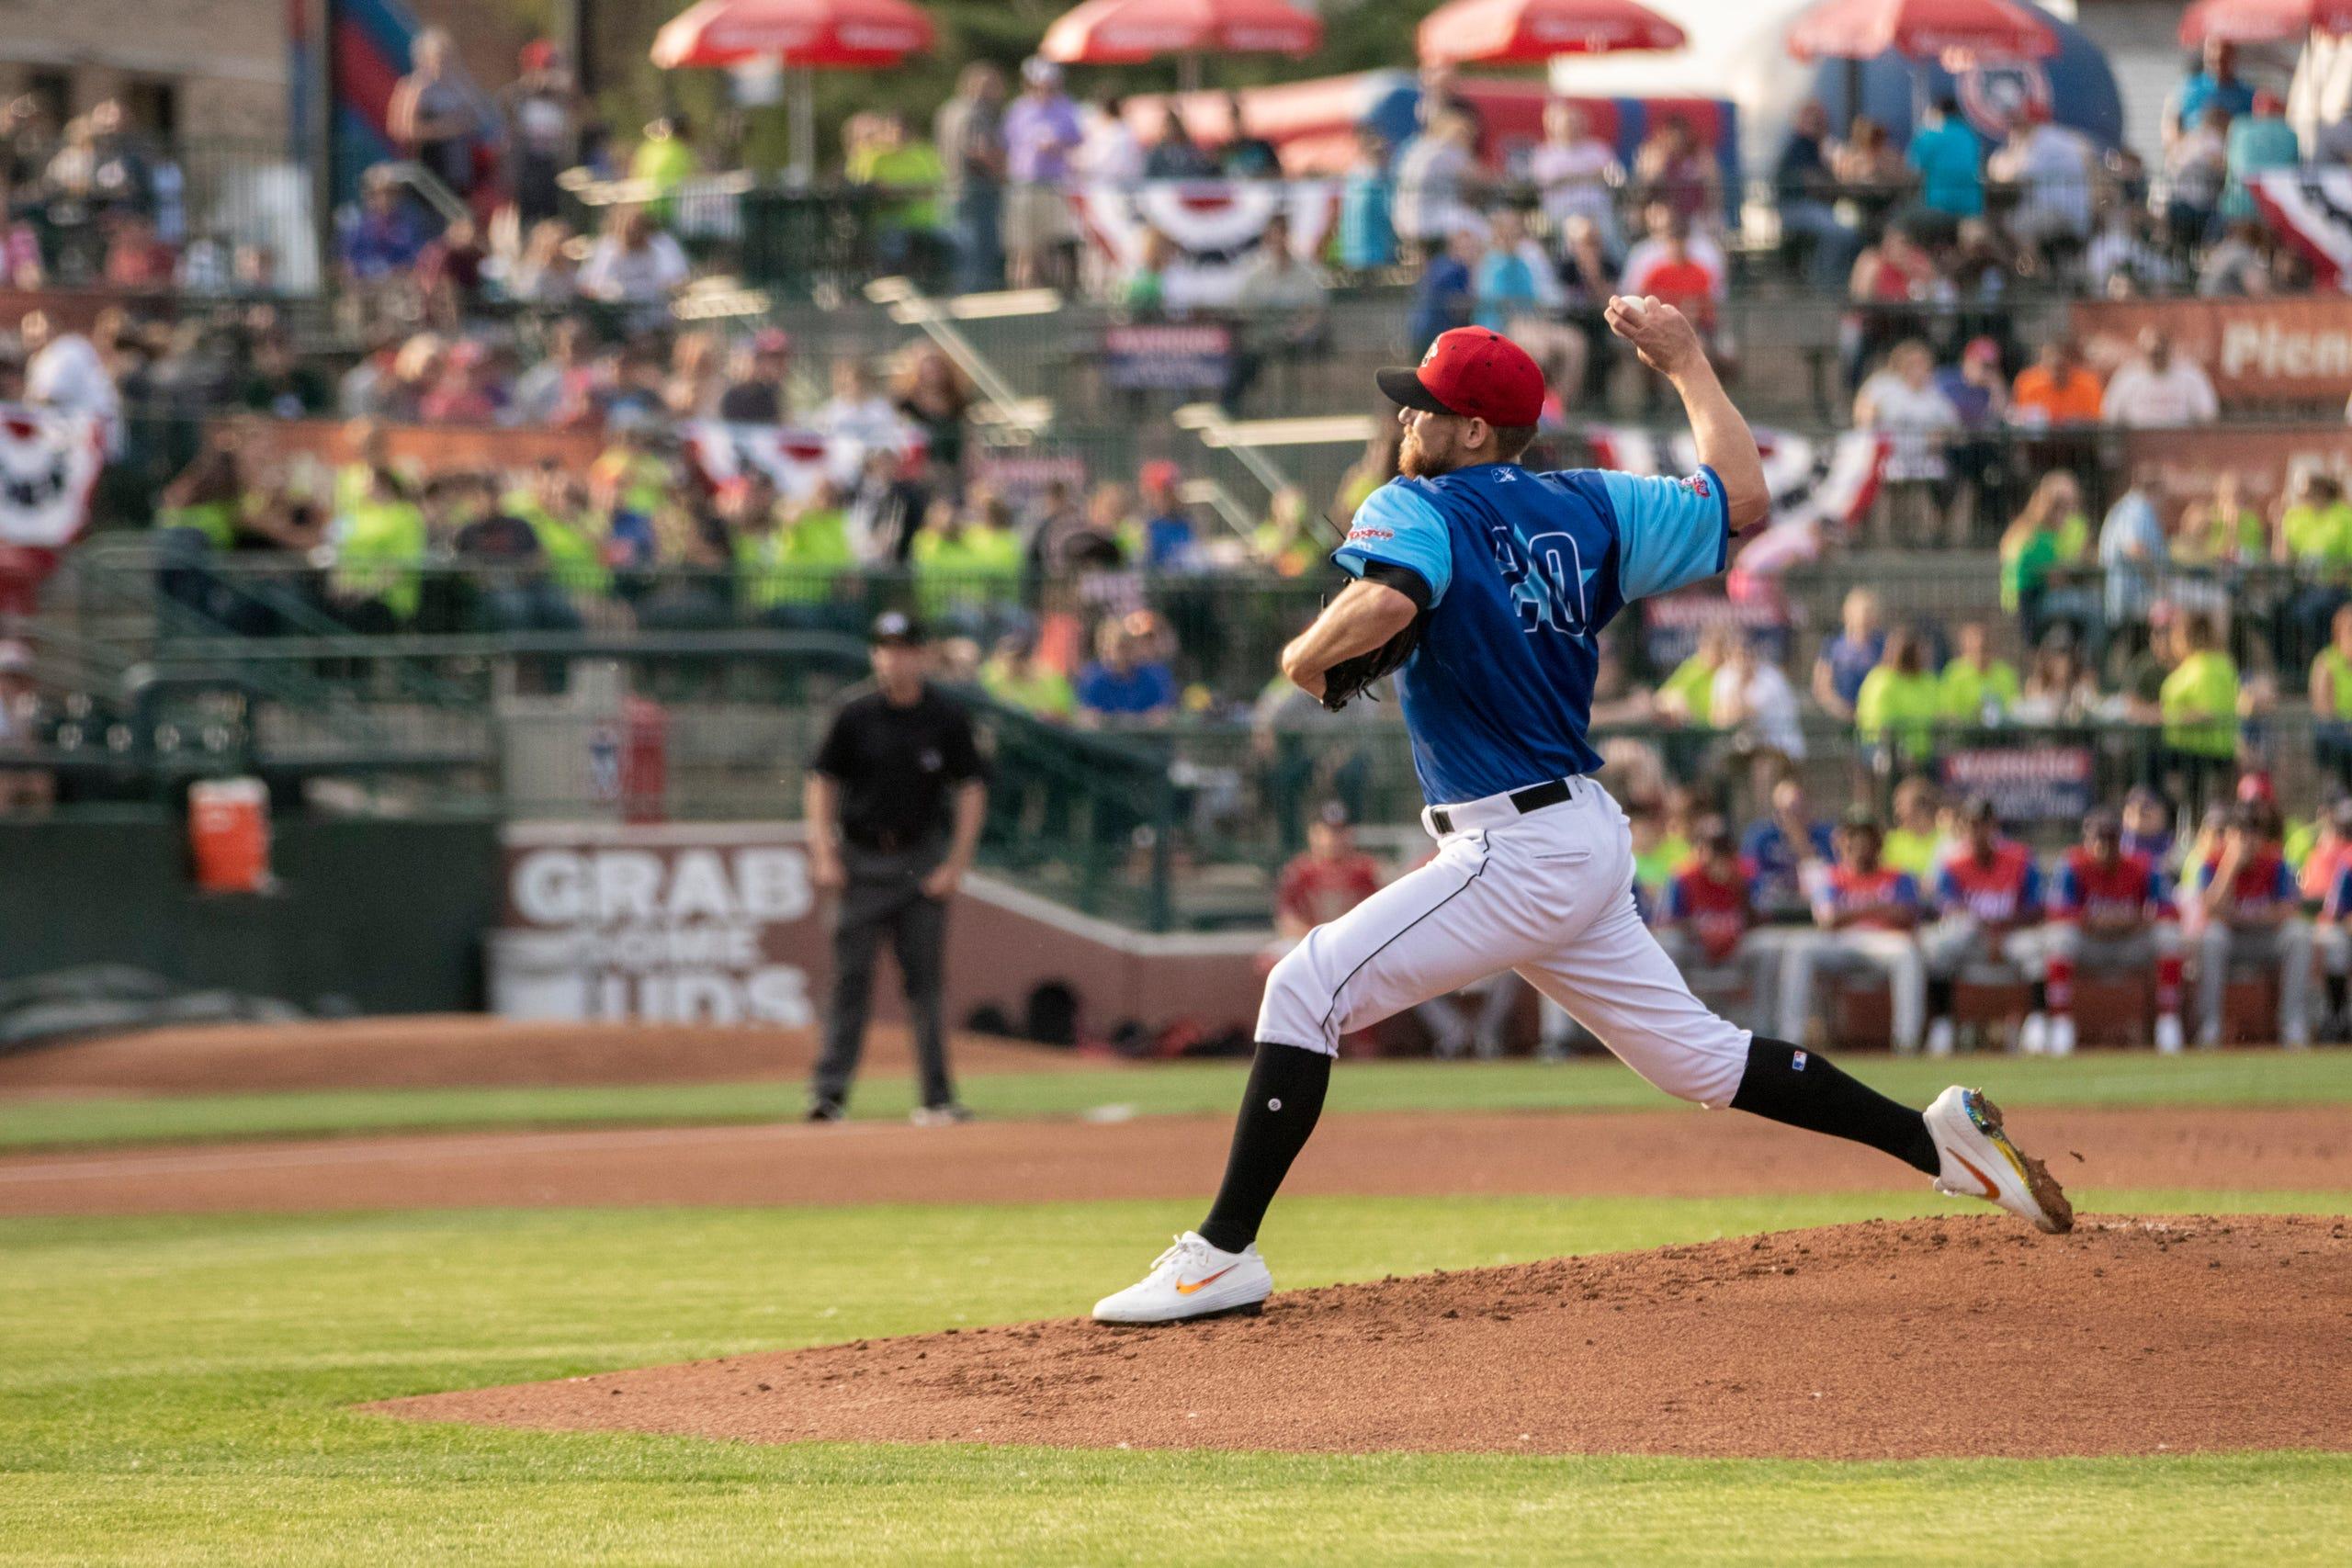 Photos: Estero grad Josh Winckowski shines in all-star game